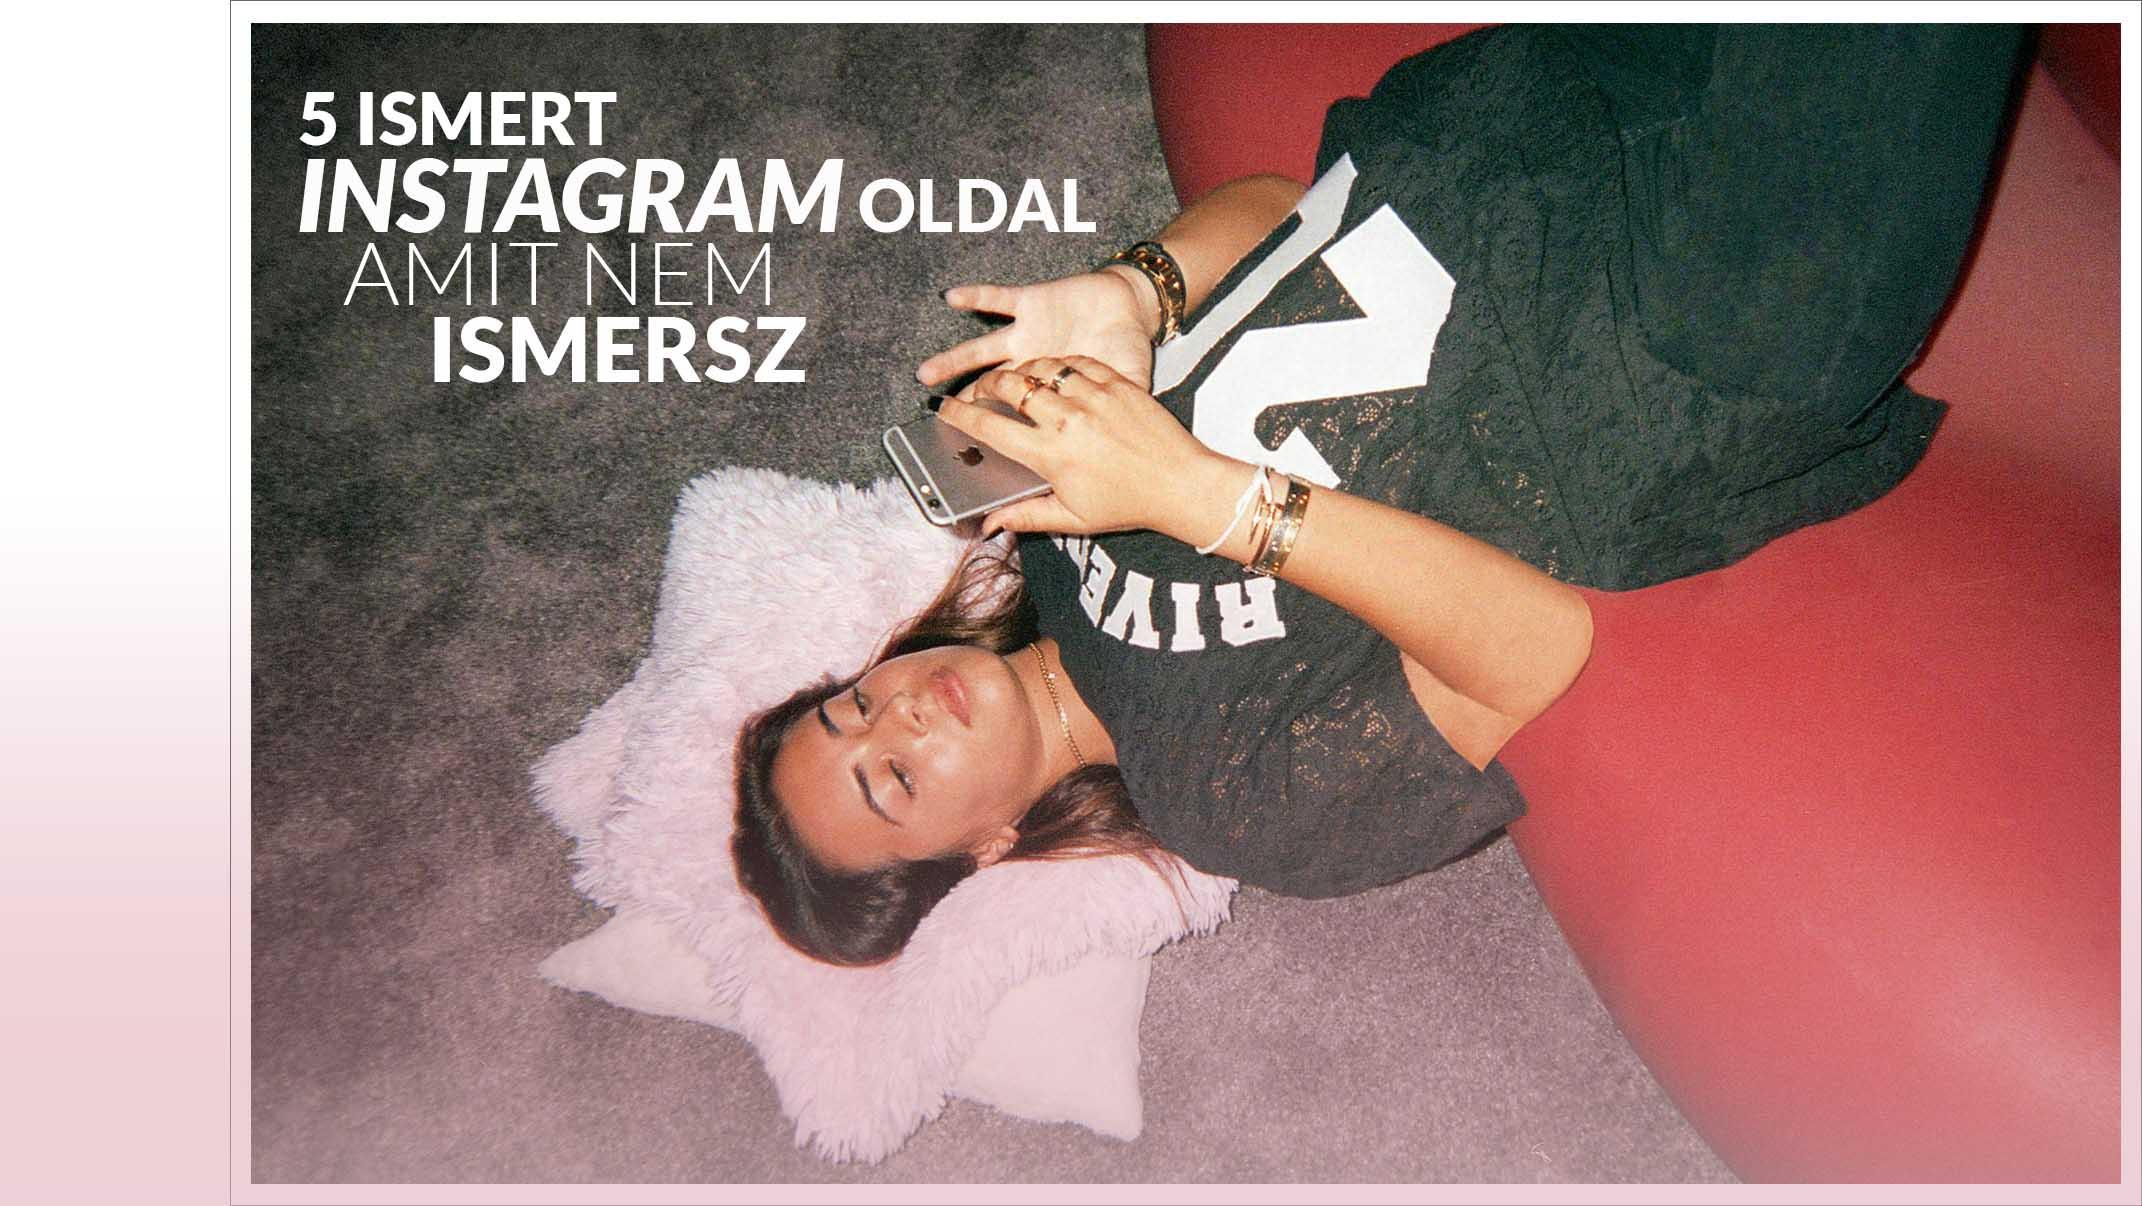 20-instagirl-1_copy.jpg